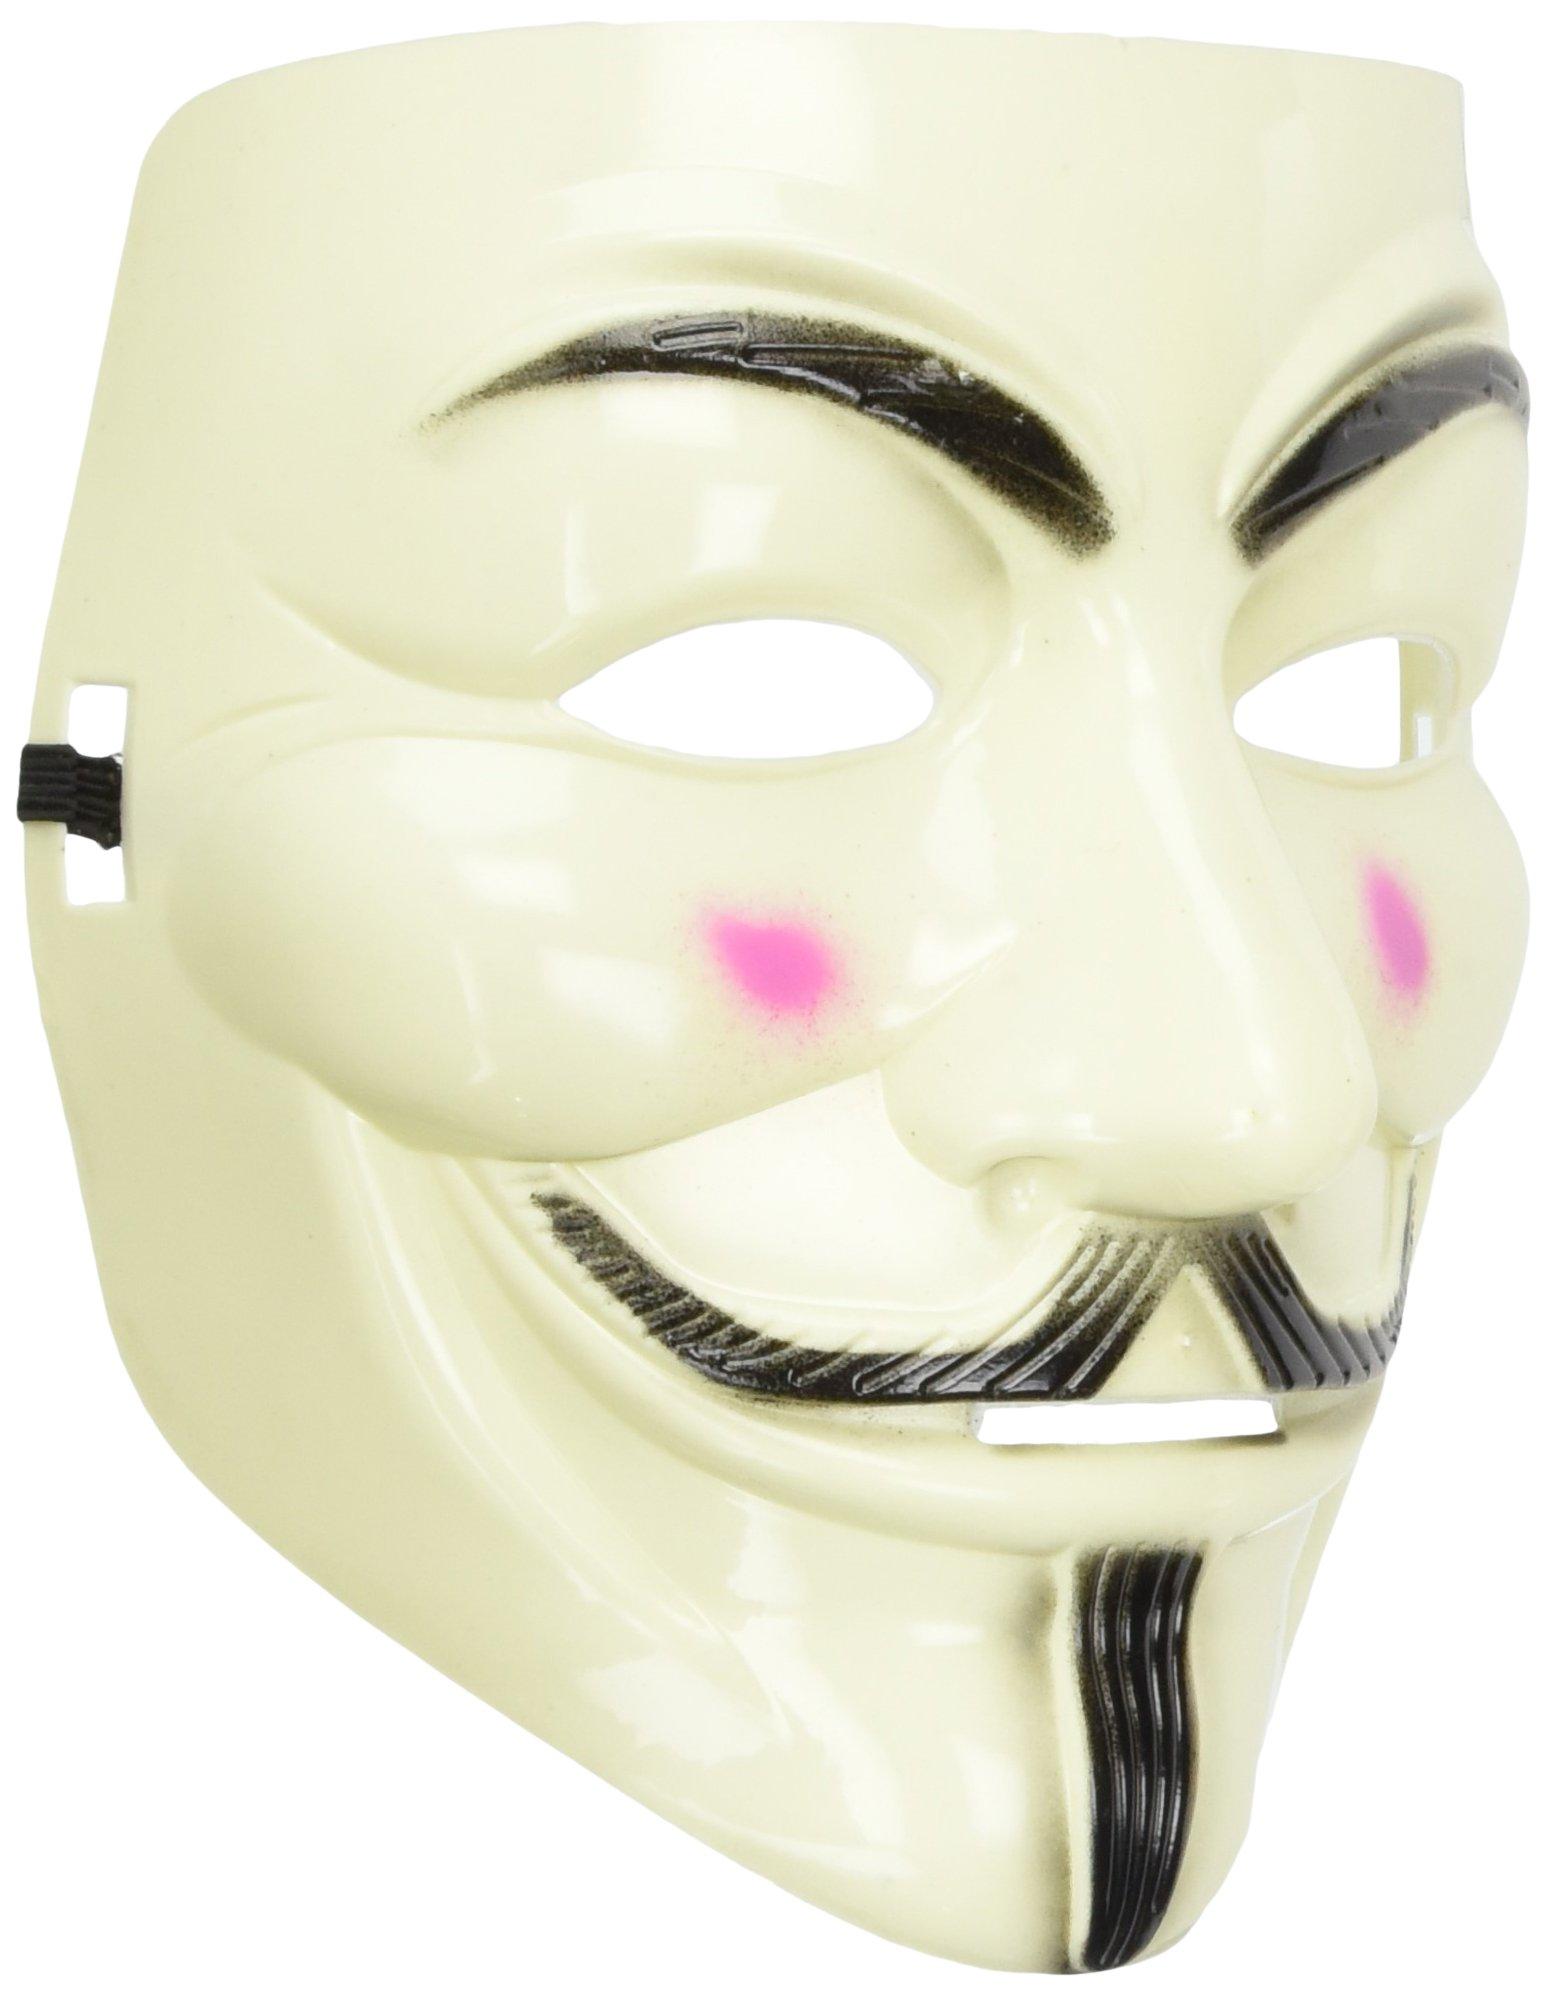 OLIA DESIGN OliaDesign V for Vendetta Mask Guy